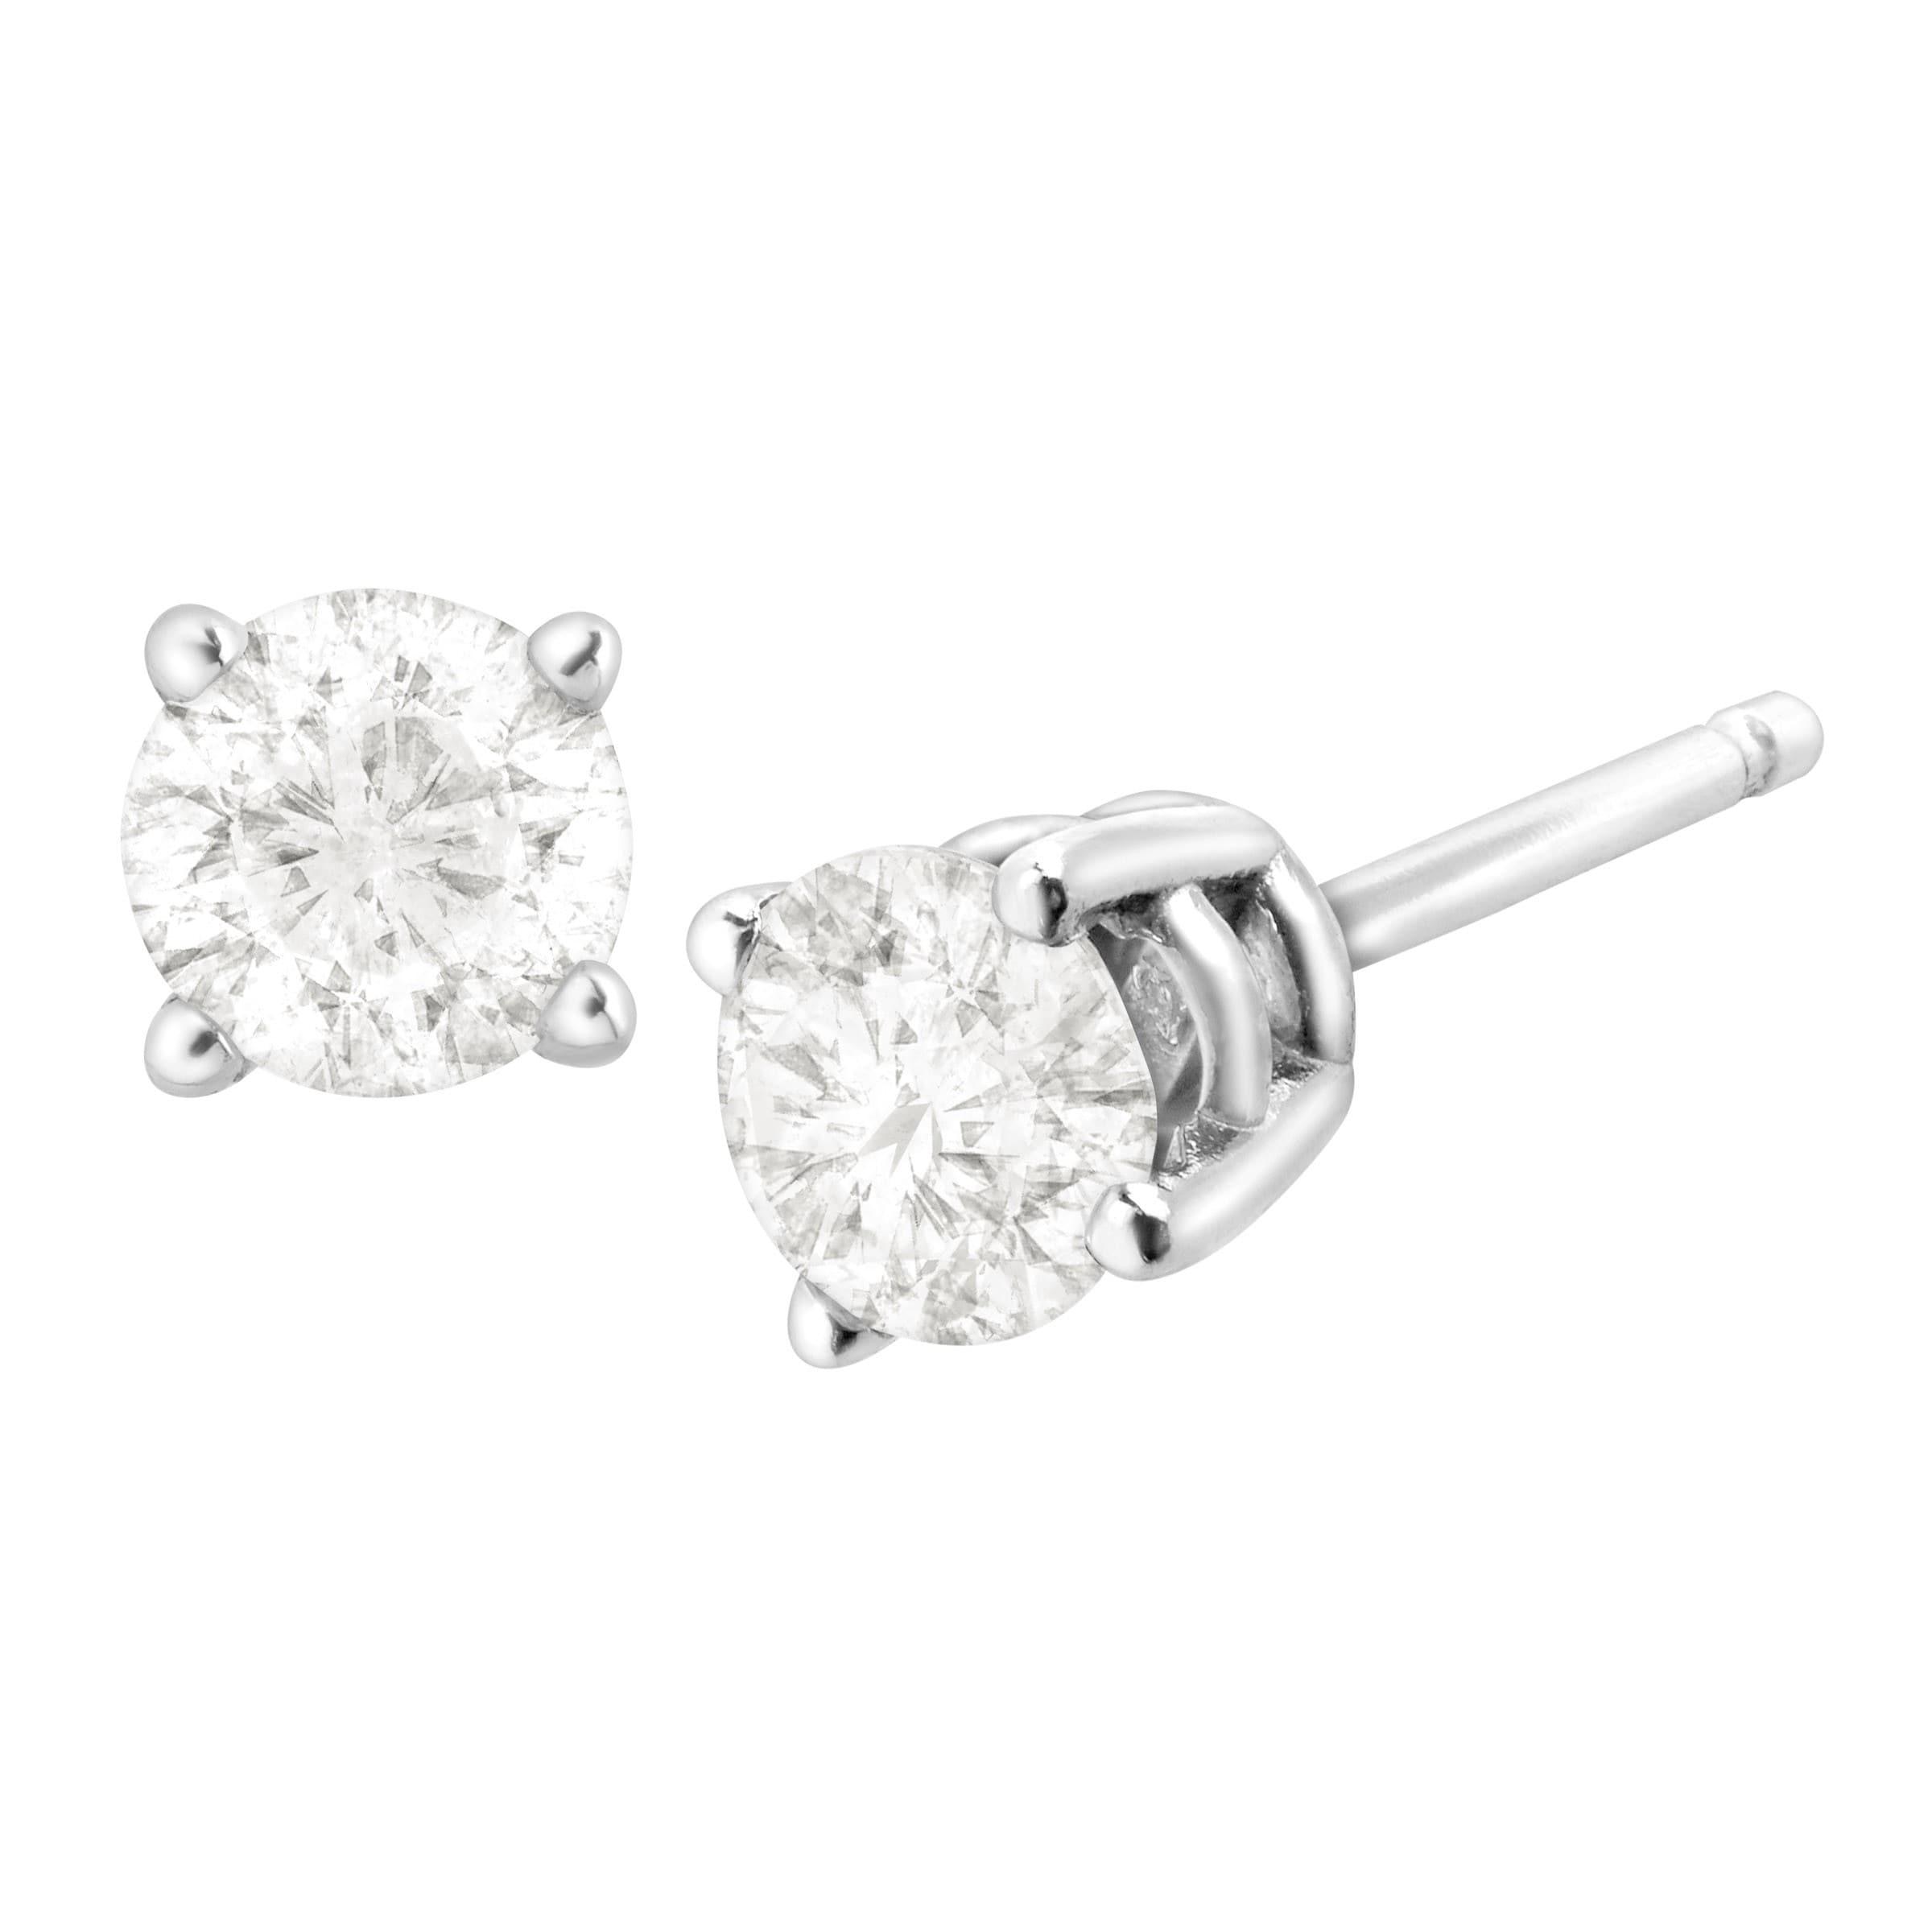 cdf823f65 Buy Diamond Earrings Online at Overstock   Our Best Earrings Deals